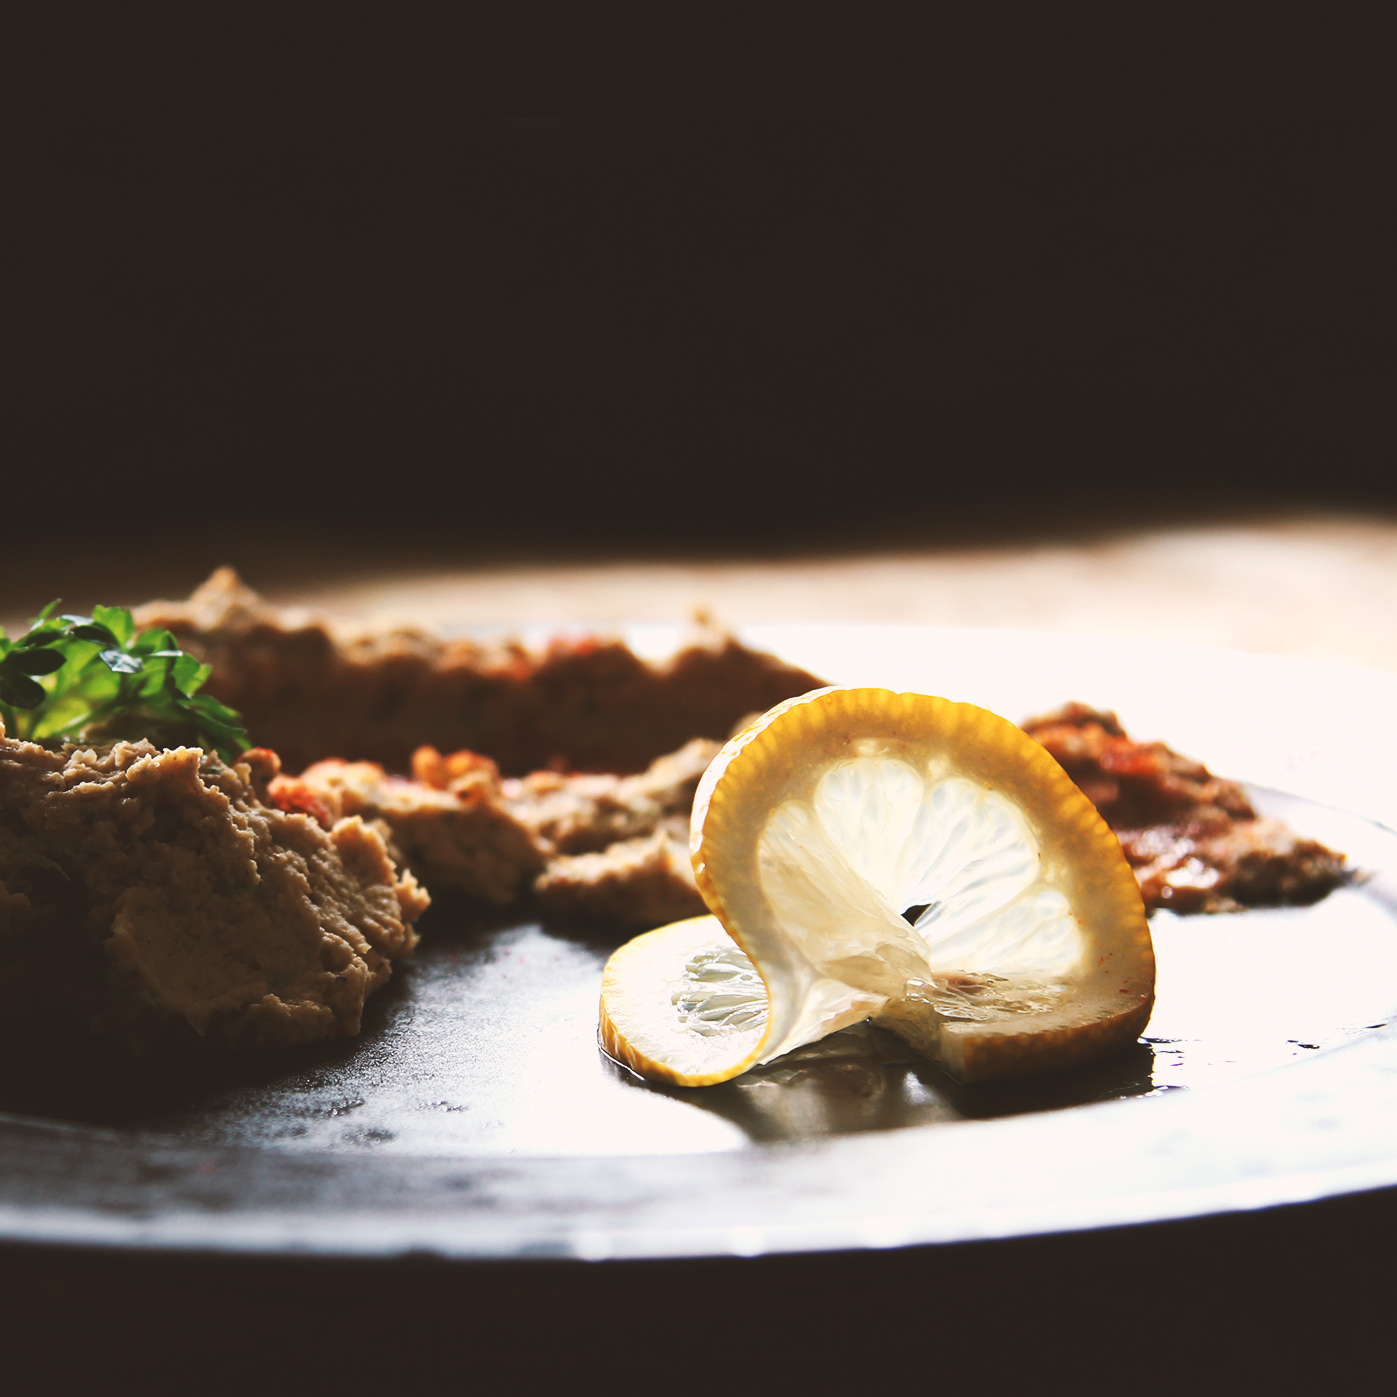 Protein Hummus- Delicious Hummus recipe with Edible worms